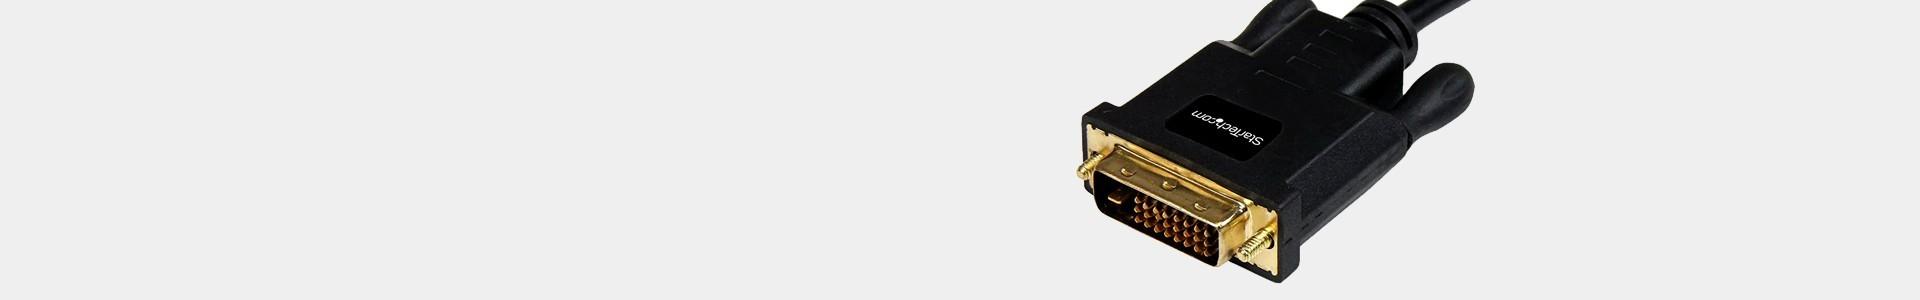 Matrici video DVI di marca leader professionale - Avacab